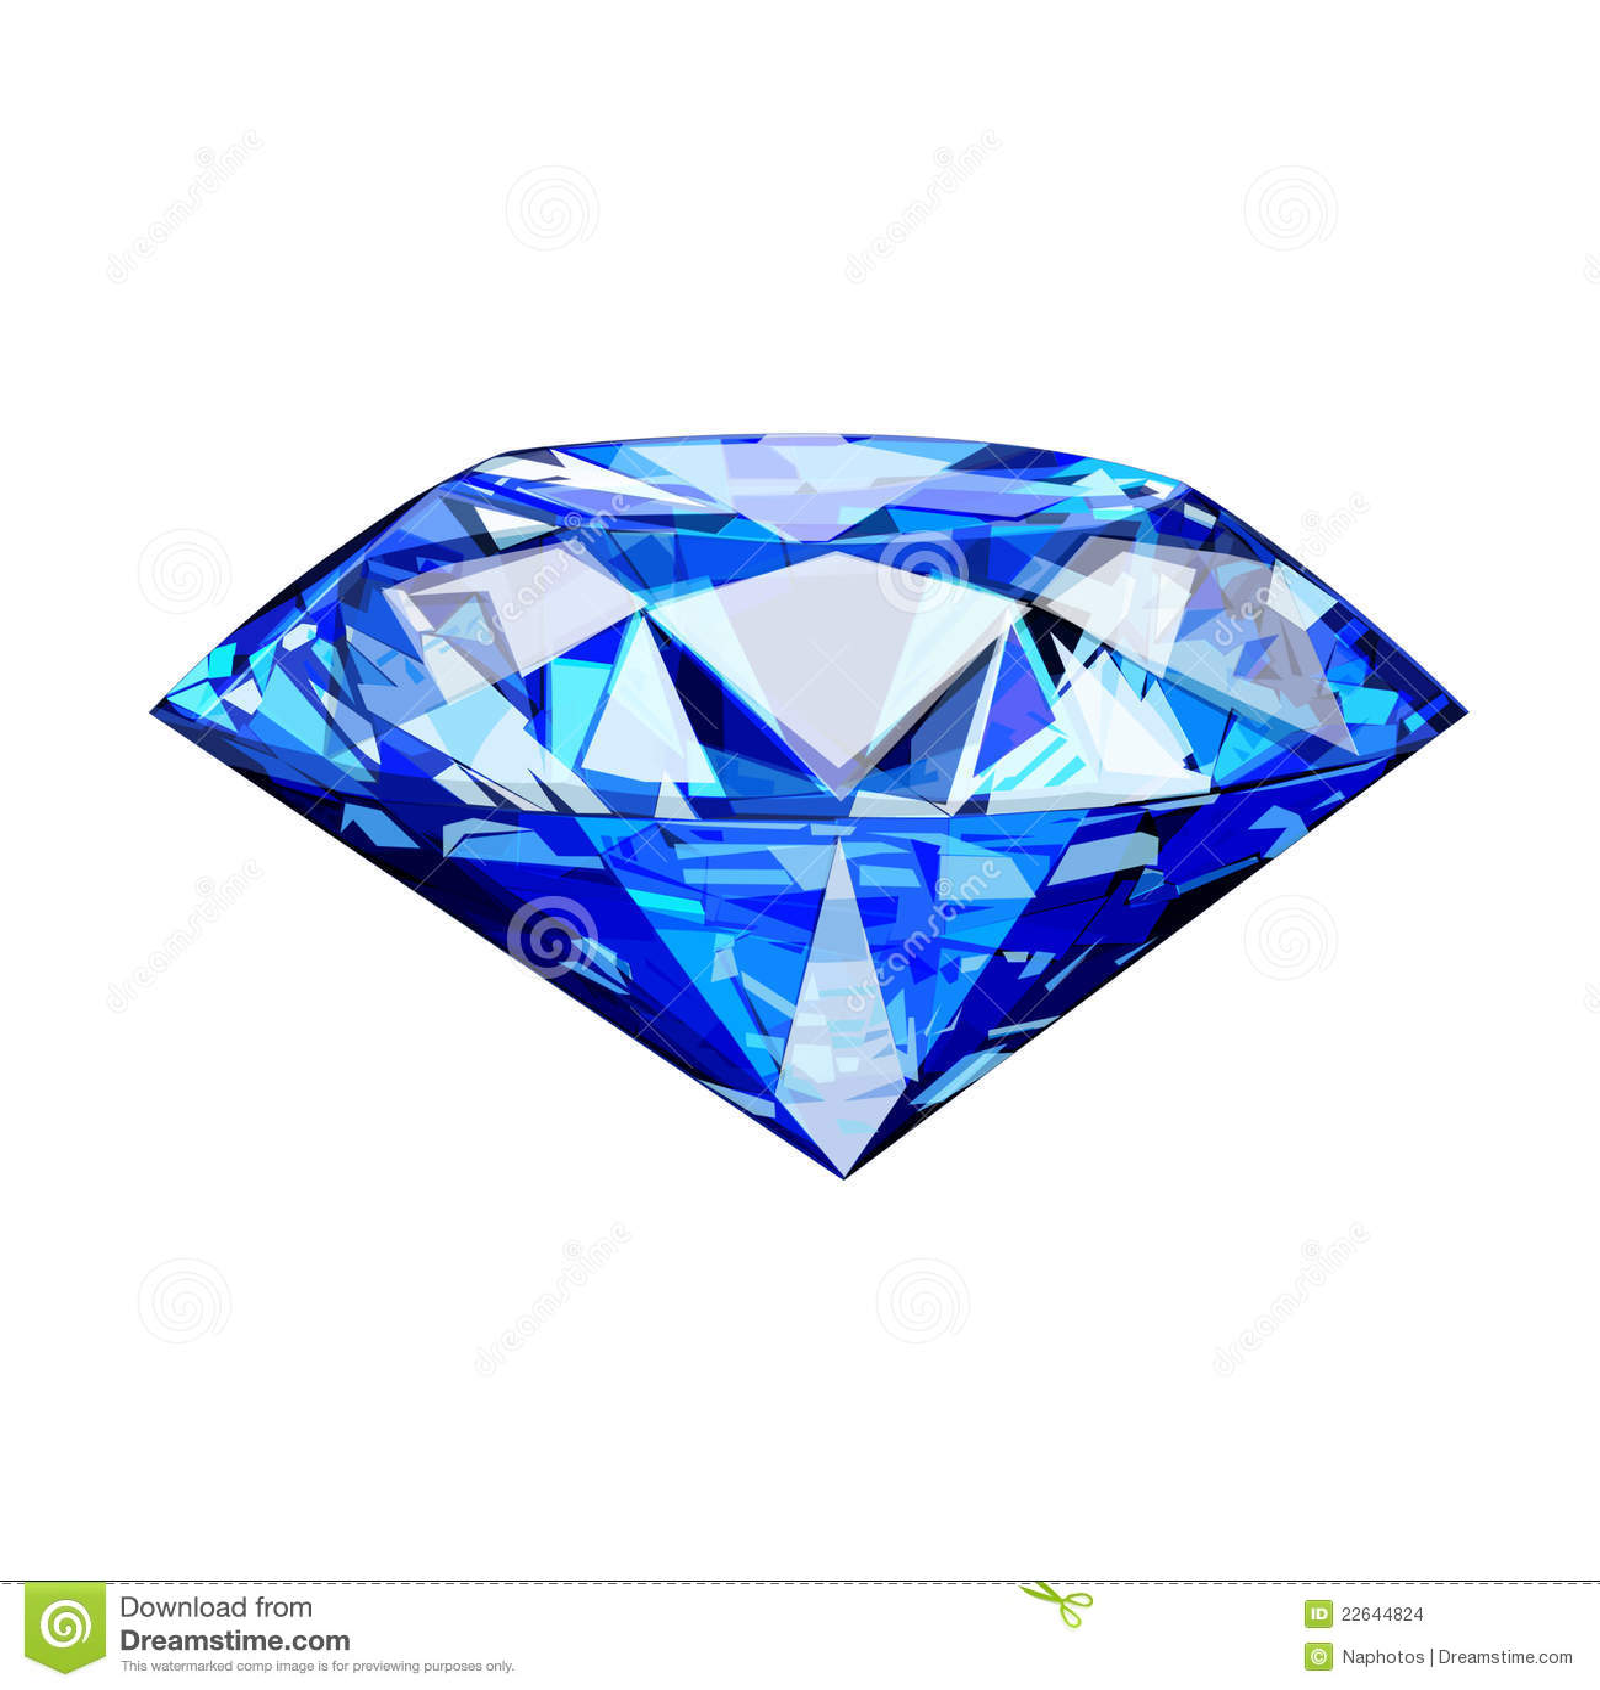 blue diamond singles & personals The blue diamonds top songs • #1: ramona • • music vf, us & uk hits charts.